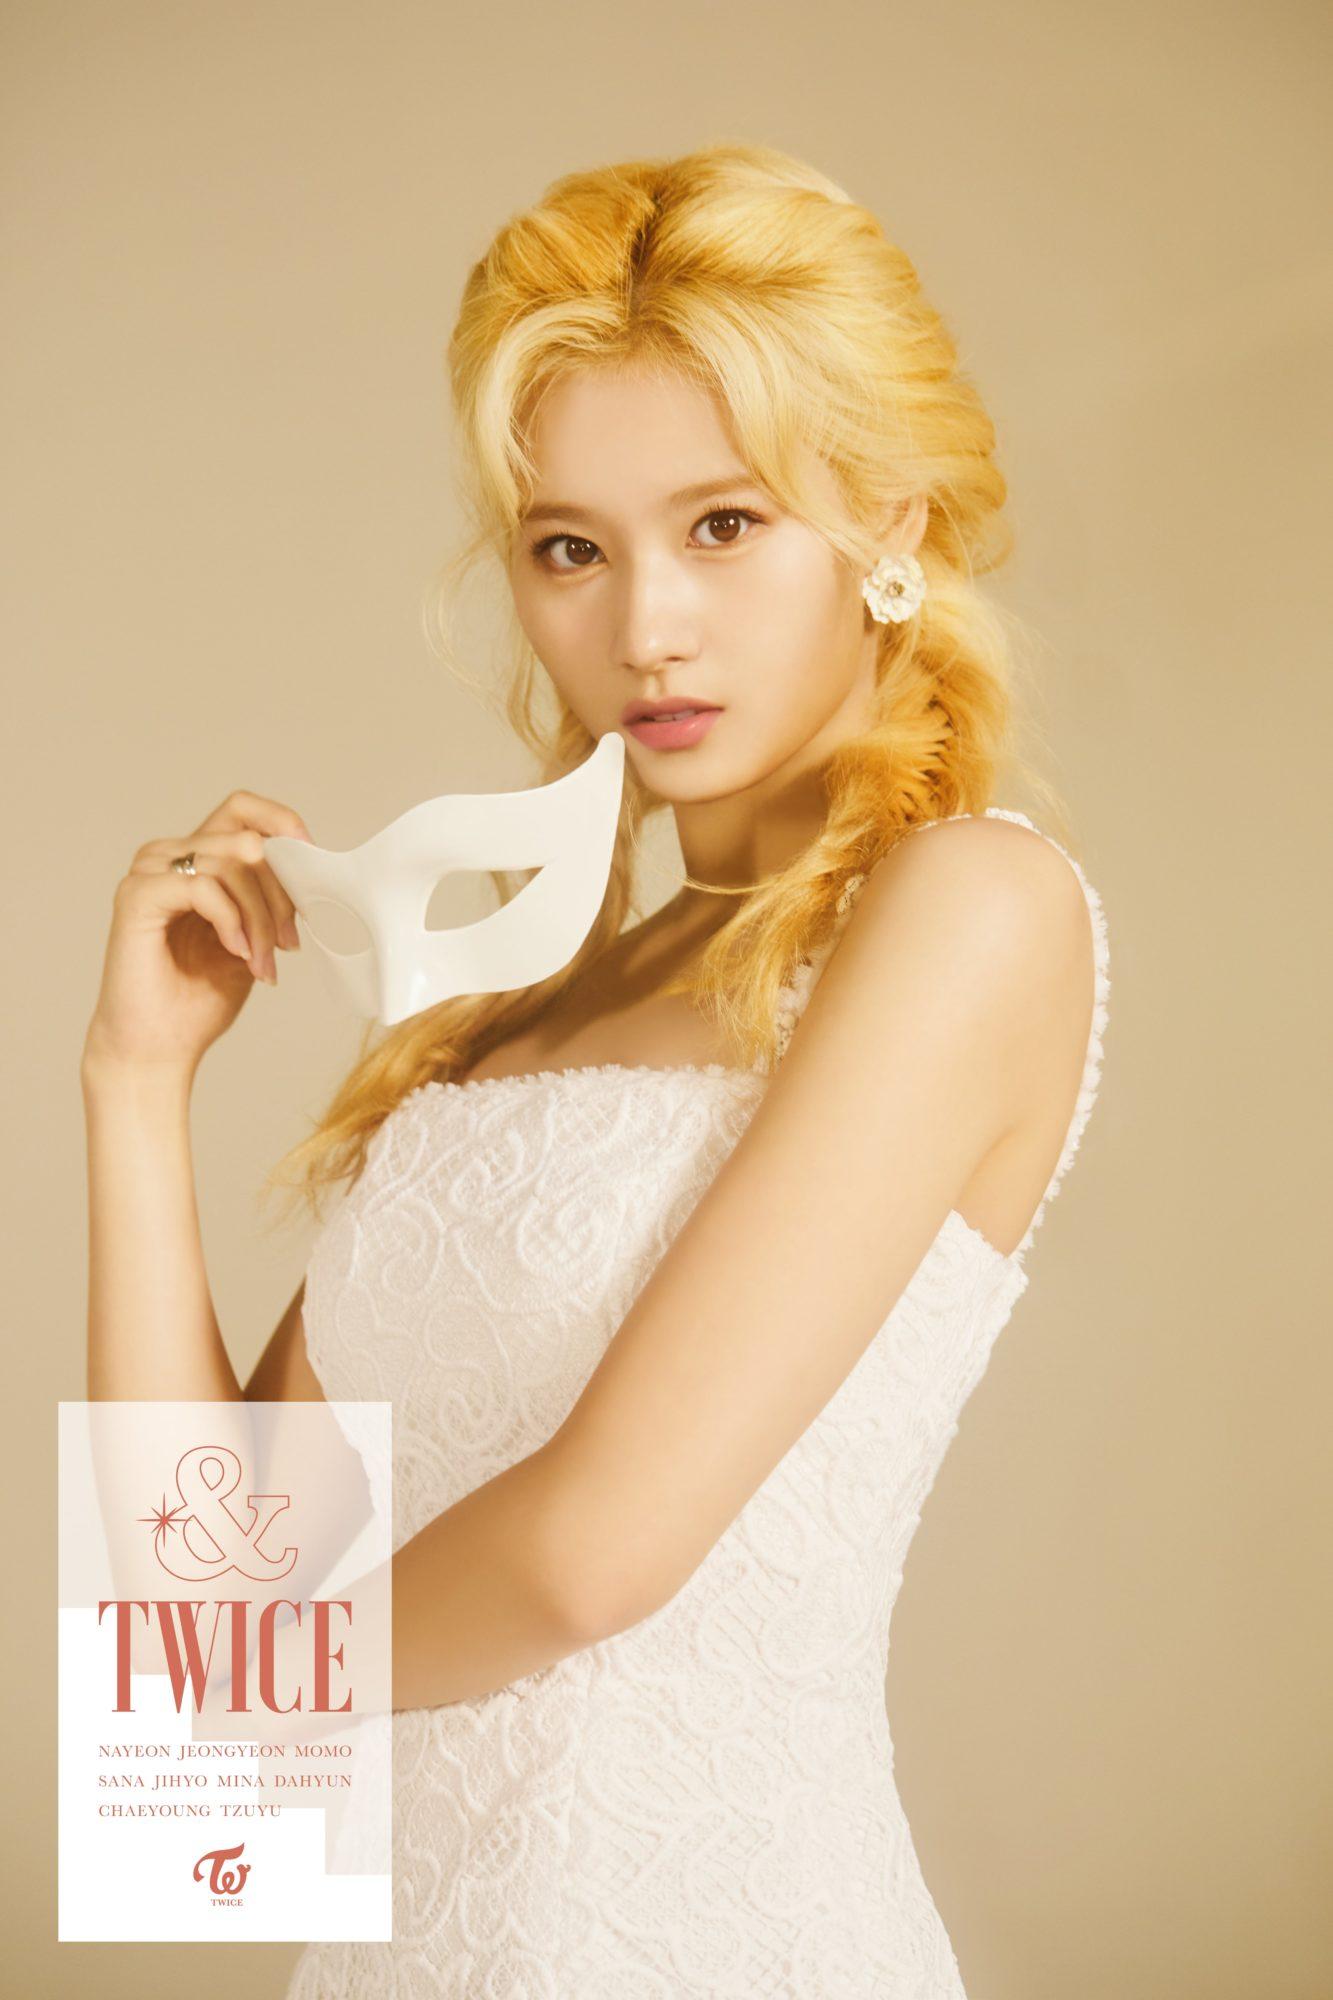 Twice &Twice Concept Sana